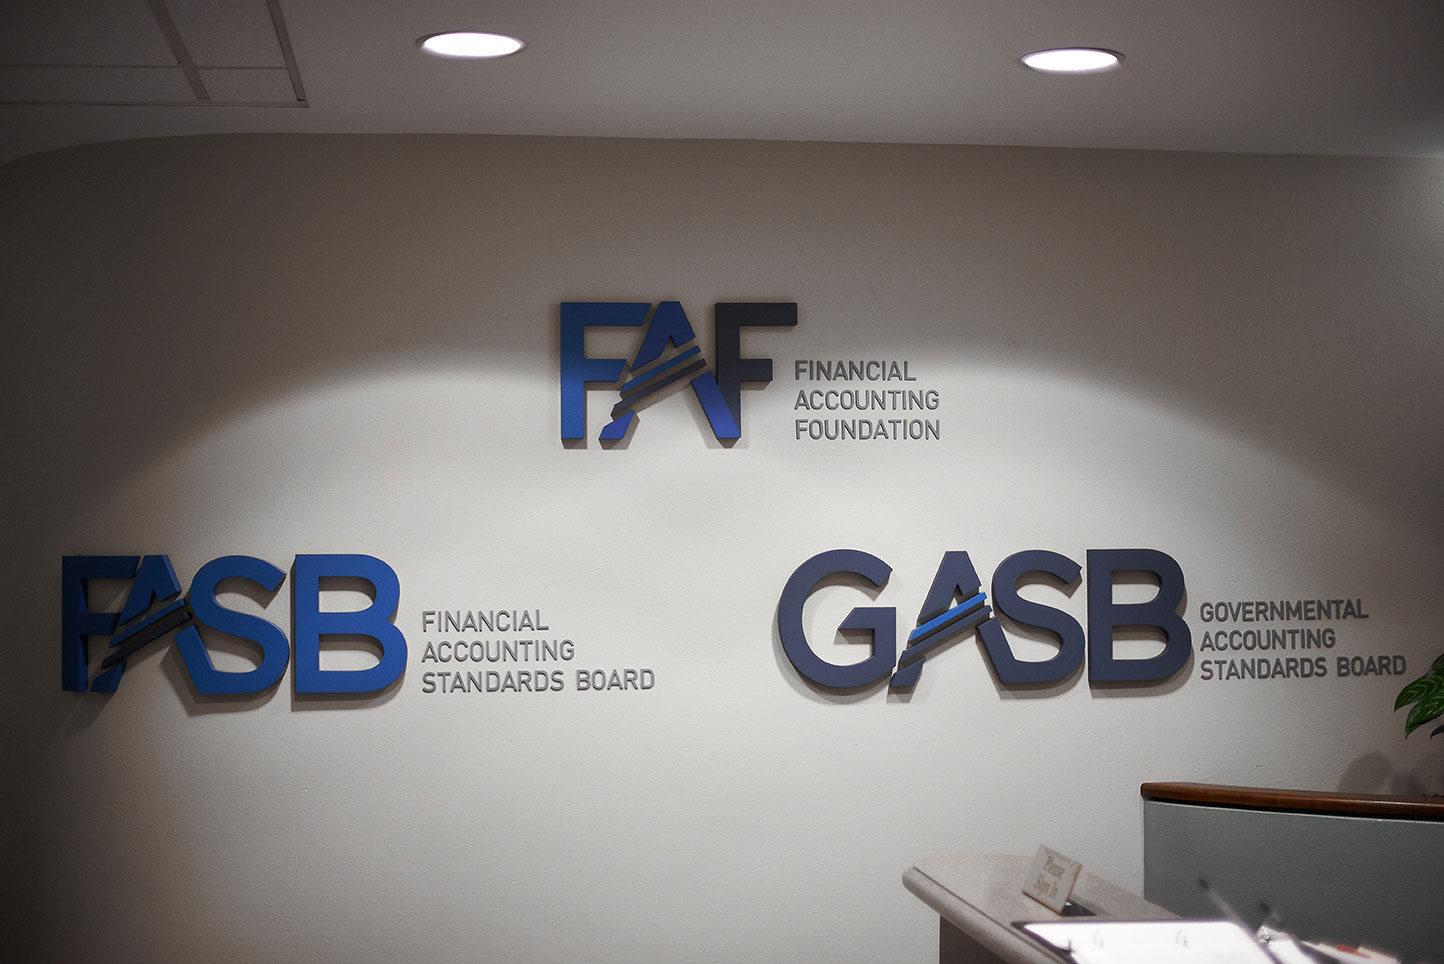 https://assets.sourcemedia.com/b5/41/0482b6354d29a4f5f4ea305f9173/fasb-gasb-faf-logos.jpg